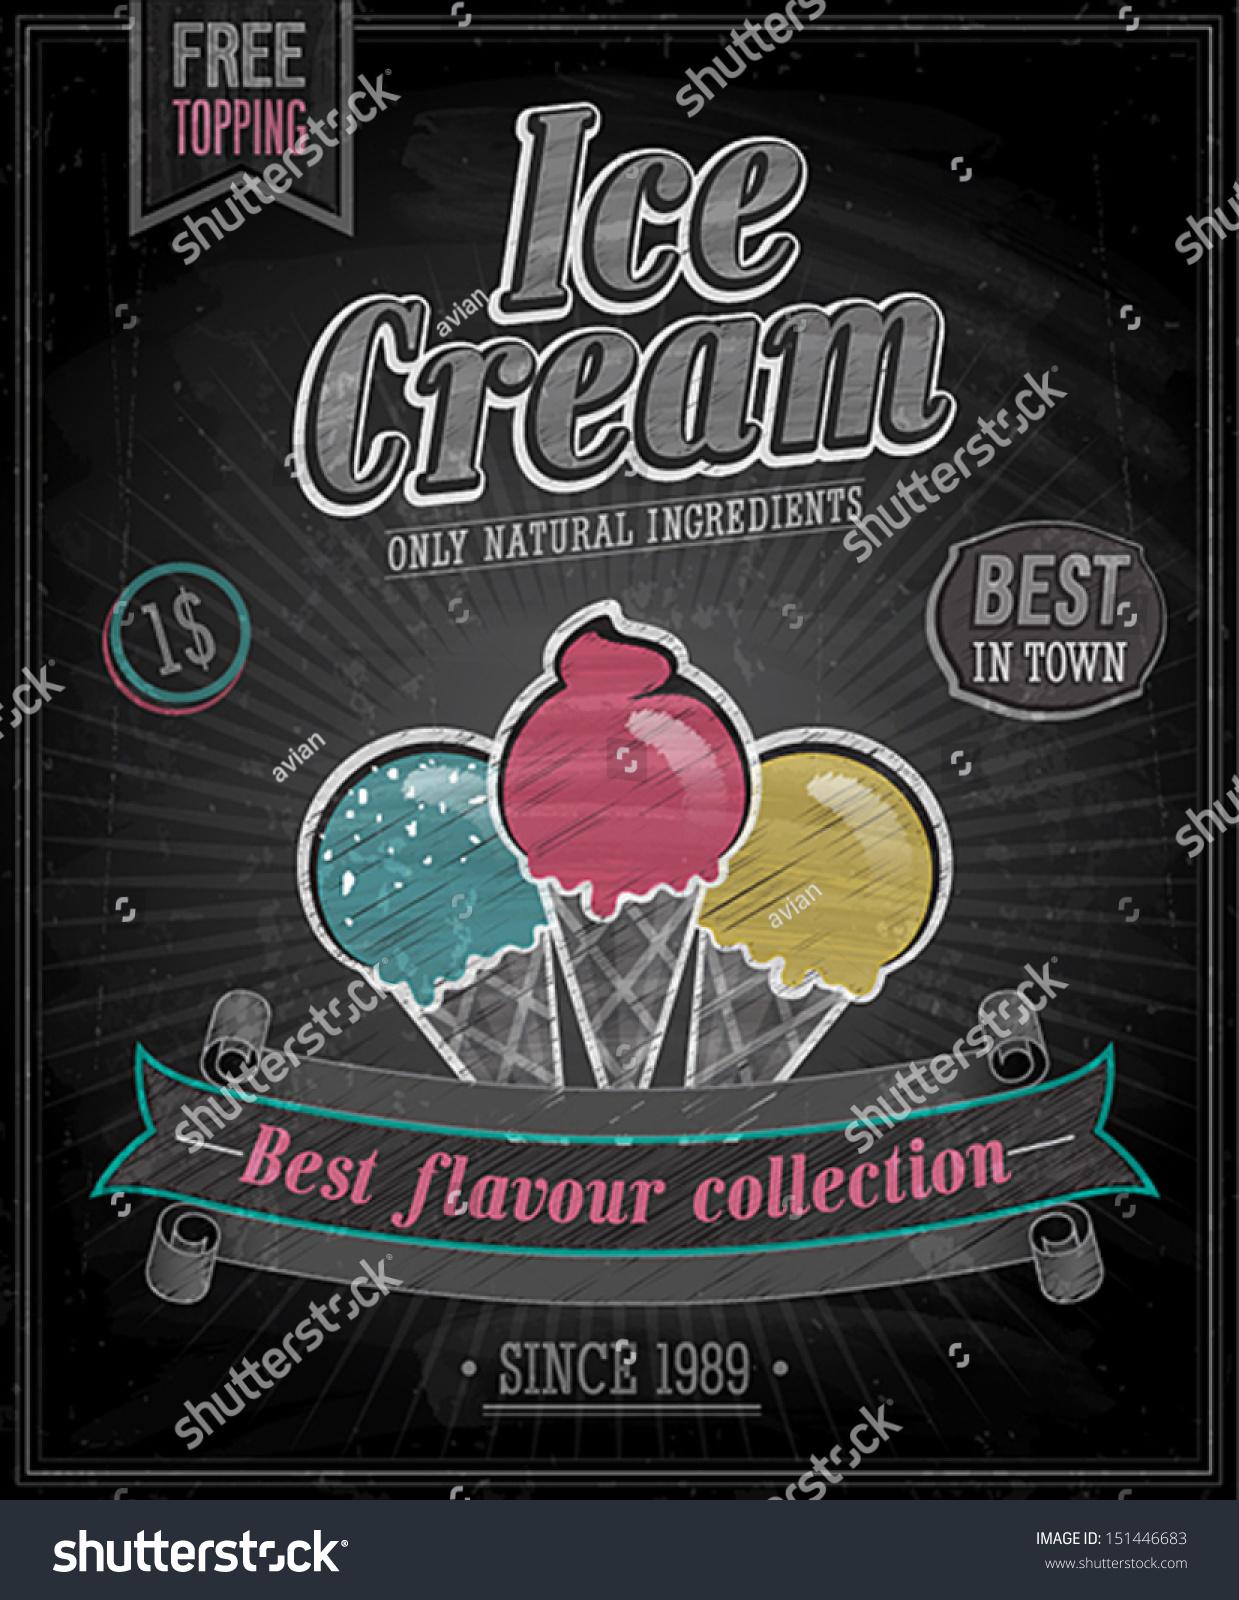 Vintage Ice Cream Poster Chalkboard Vector Stock Vector